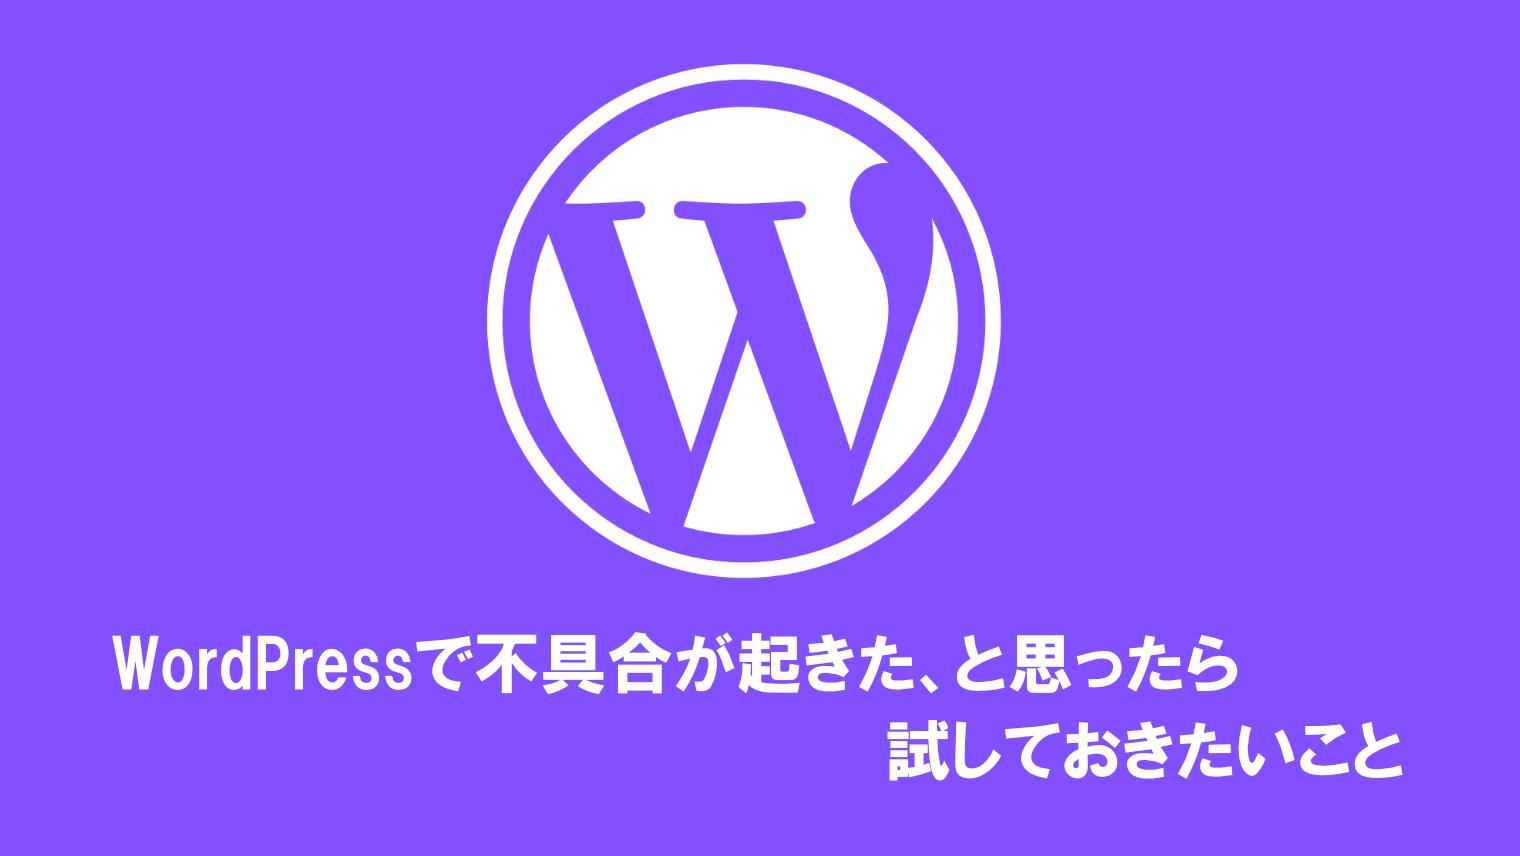 WordPressで不具合が起きた、と思ったら試しておきたいこと